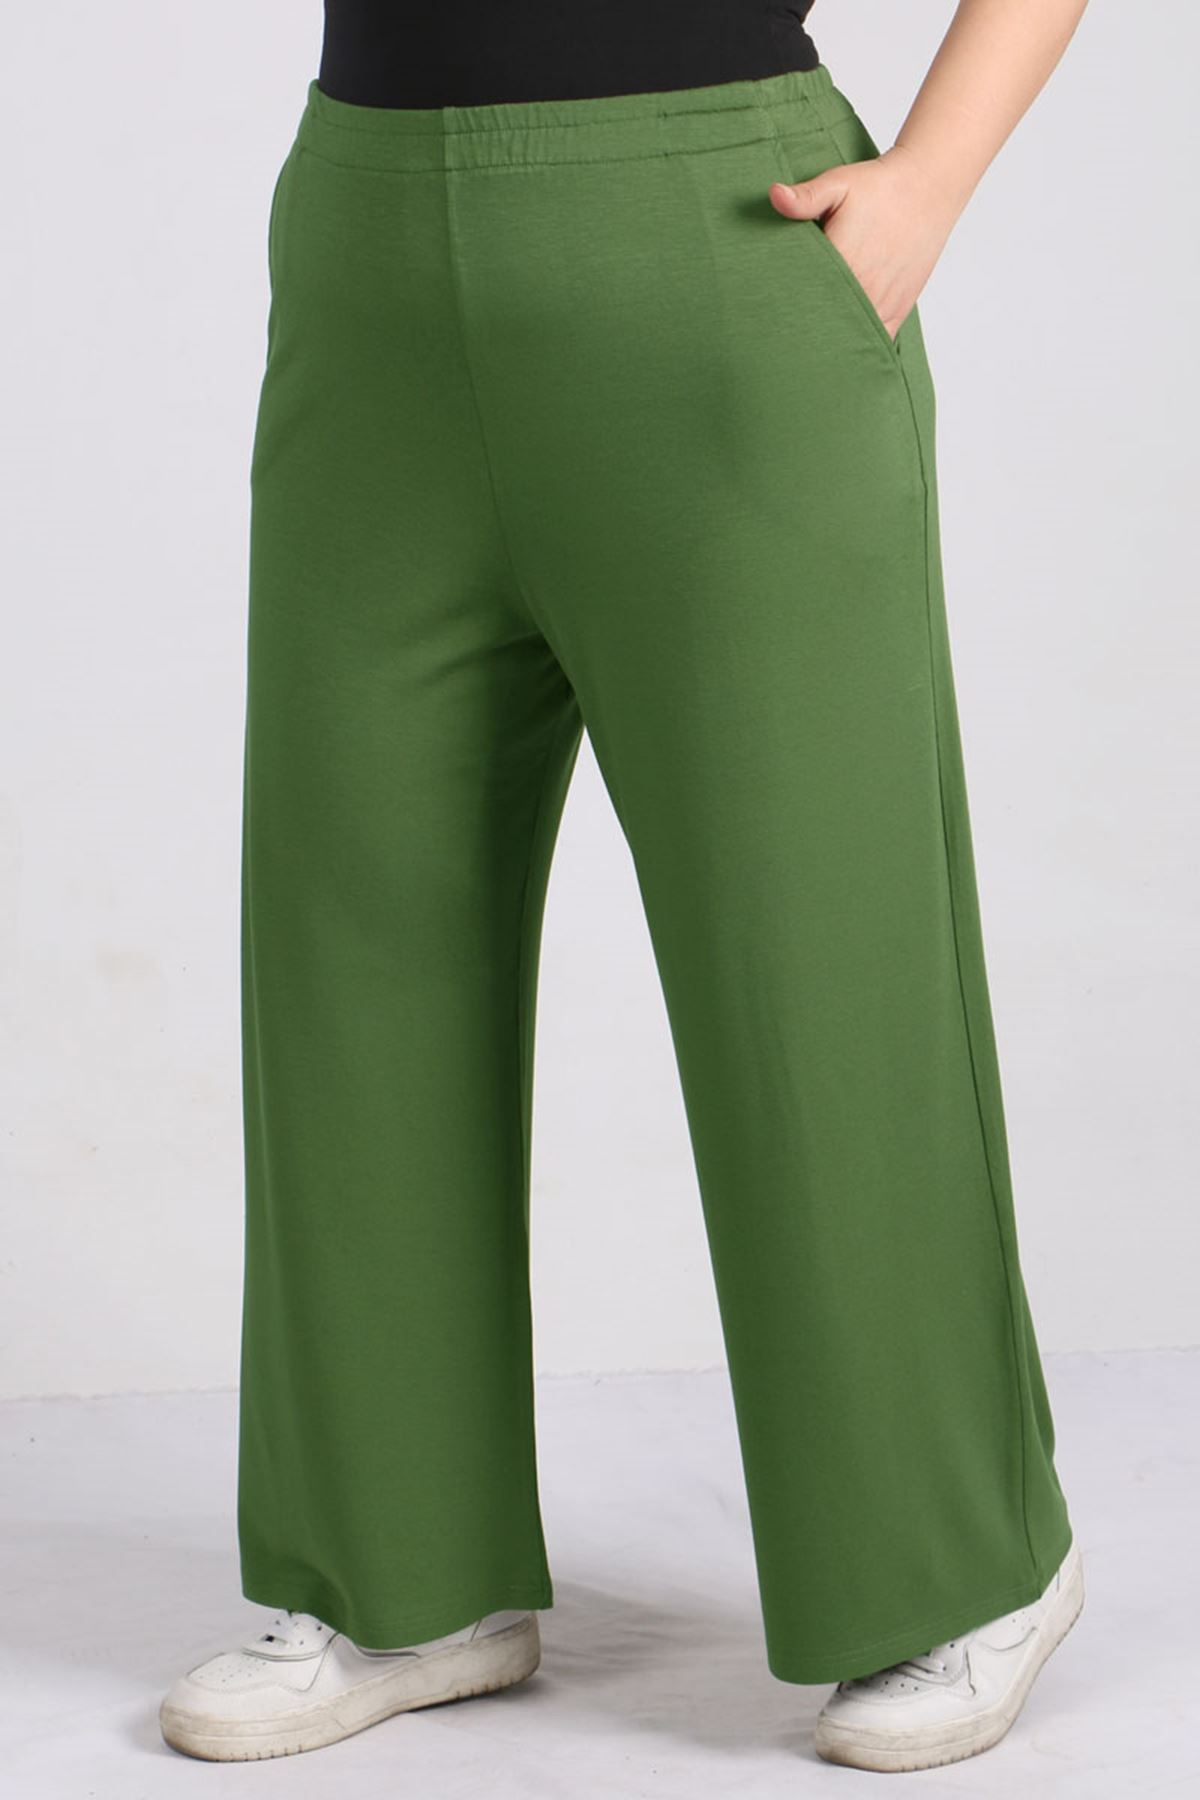 9012 Plus Size Elastic Waist Pants - Green